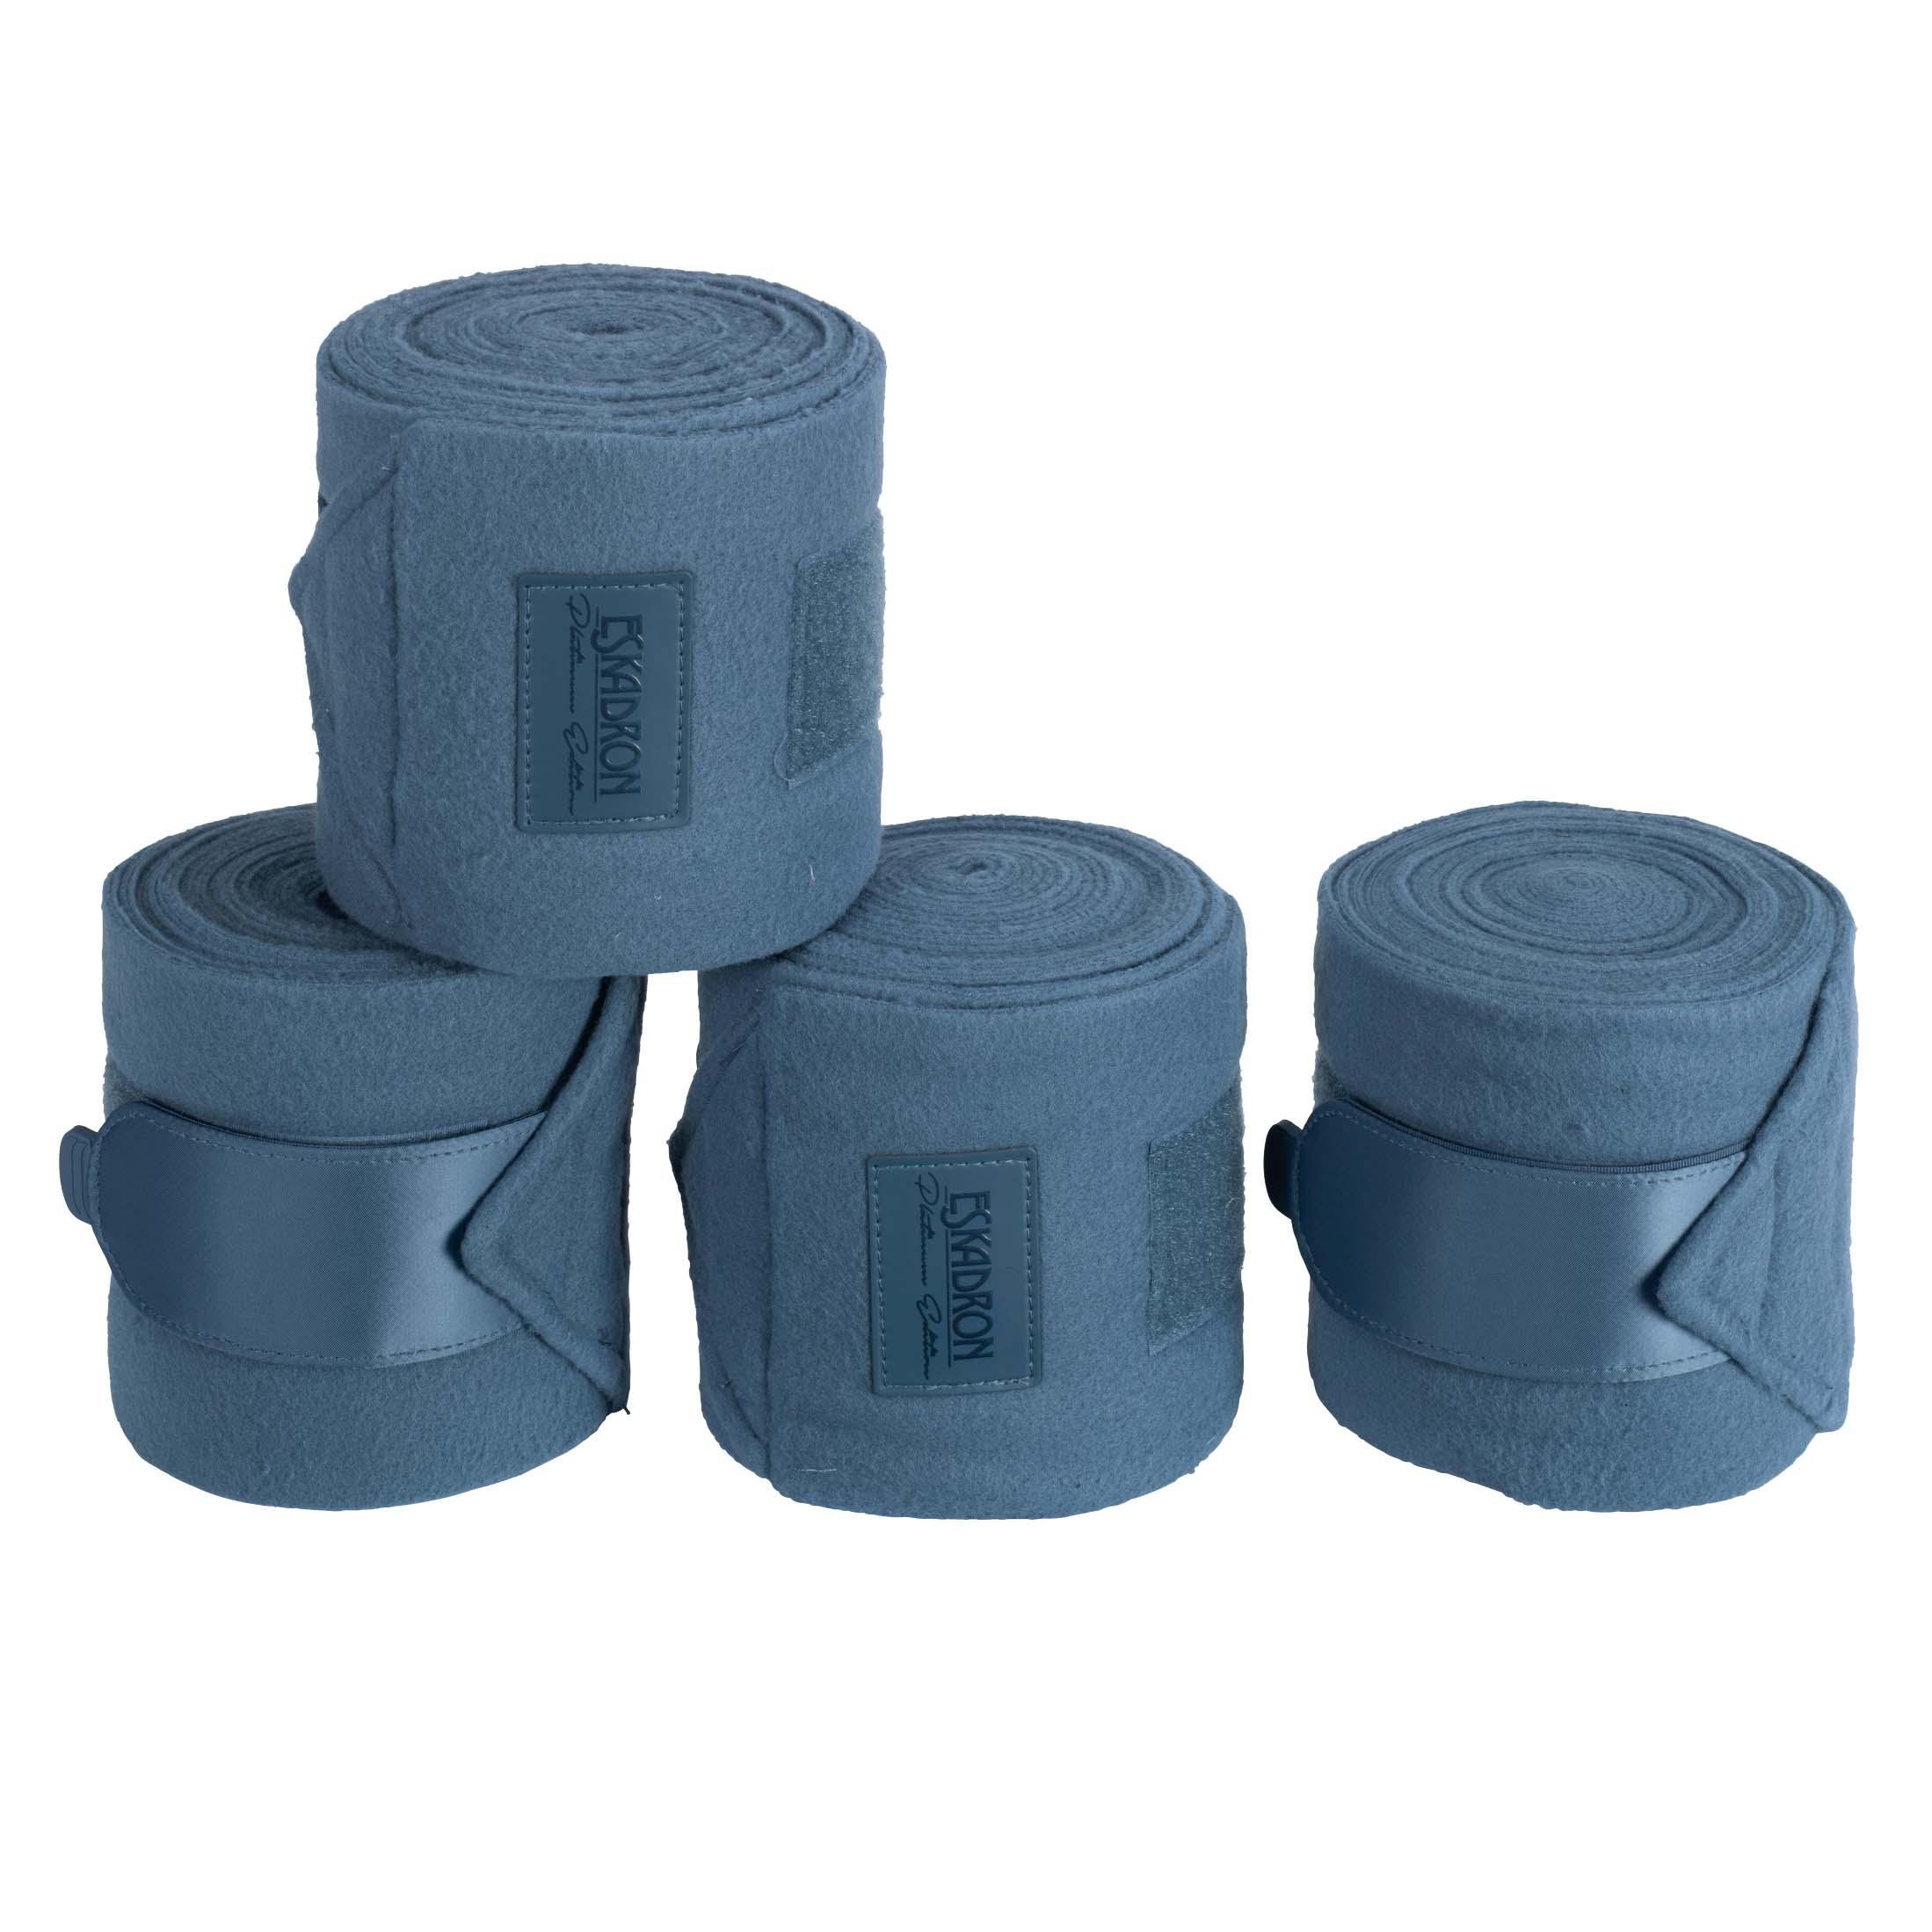 Eskadron Platinum Fleece bandages blauw maat:full